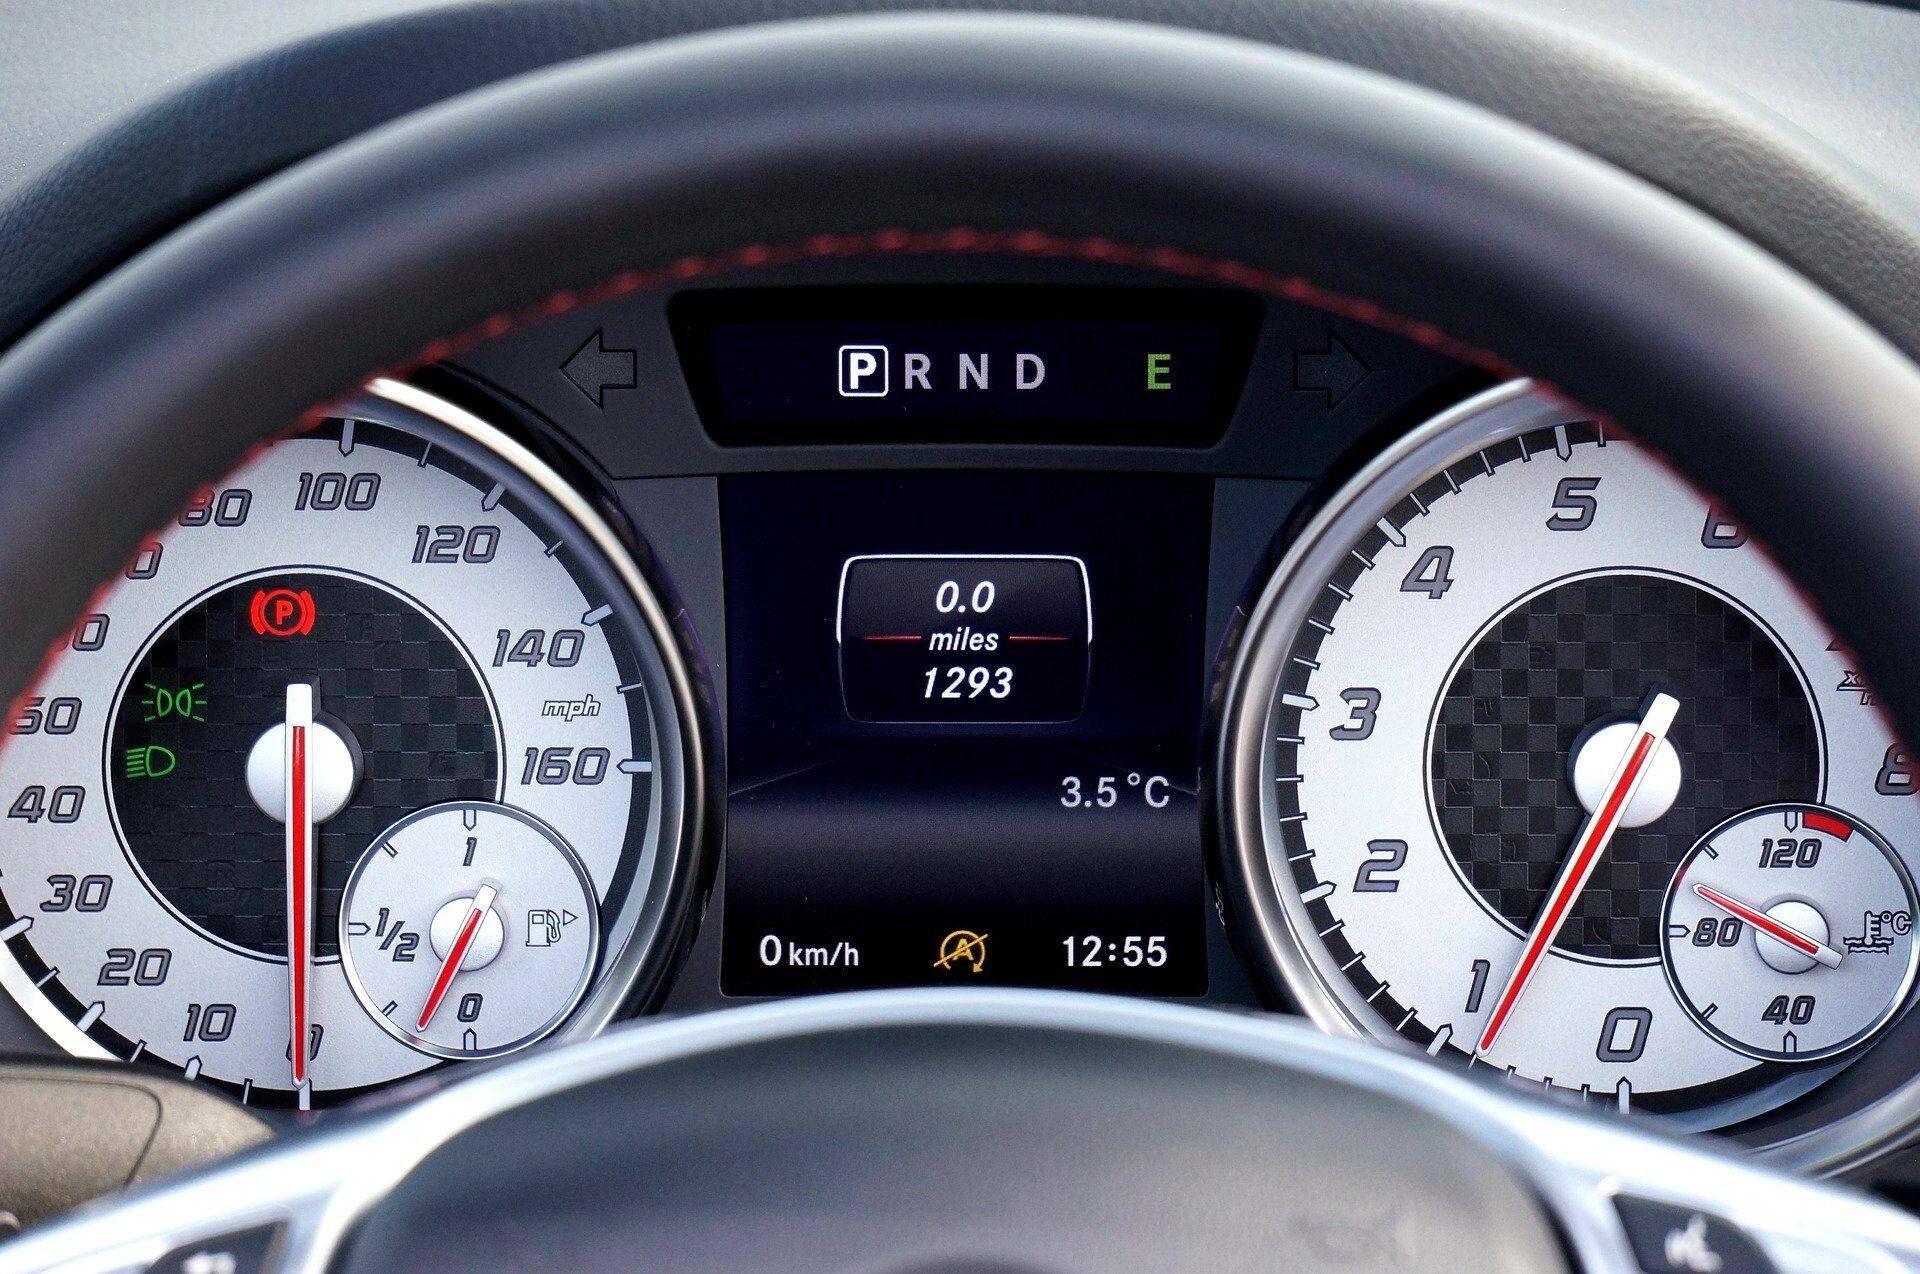 Mercedes Benz A250 AMG 2019